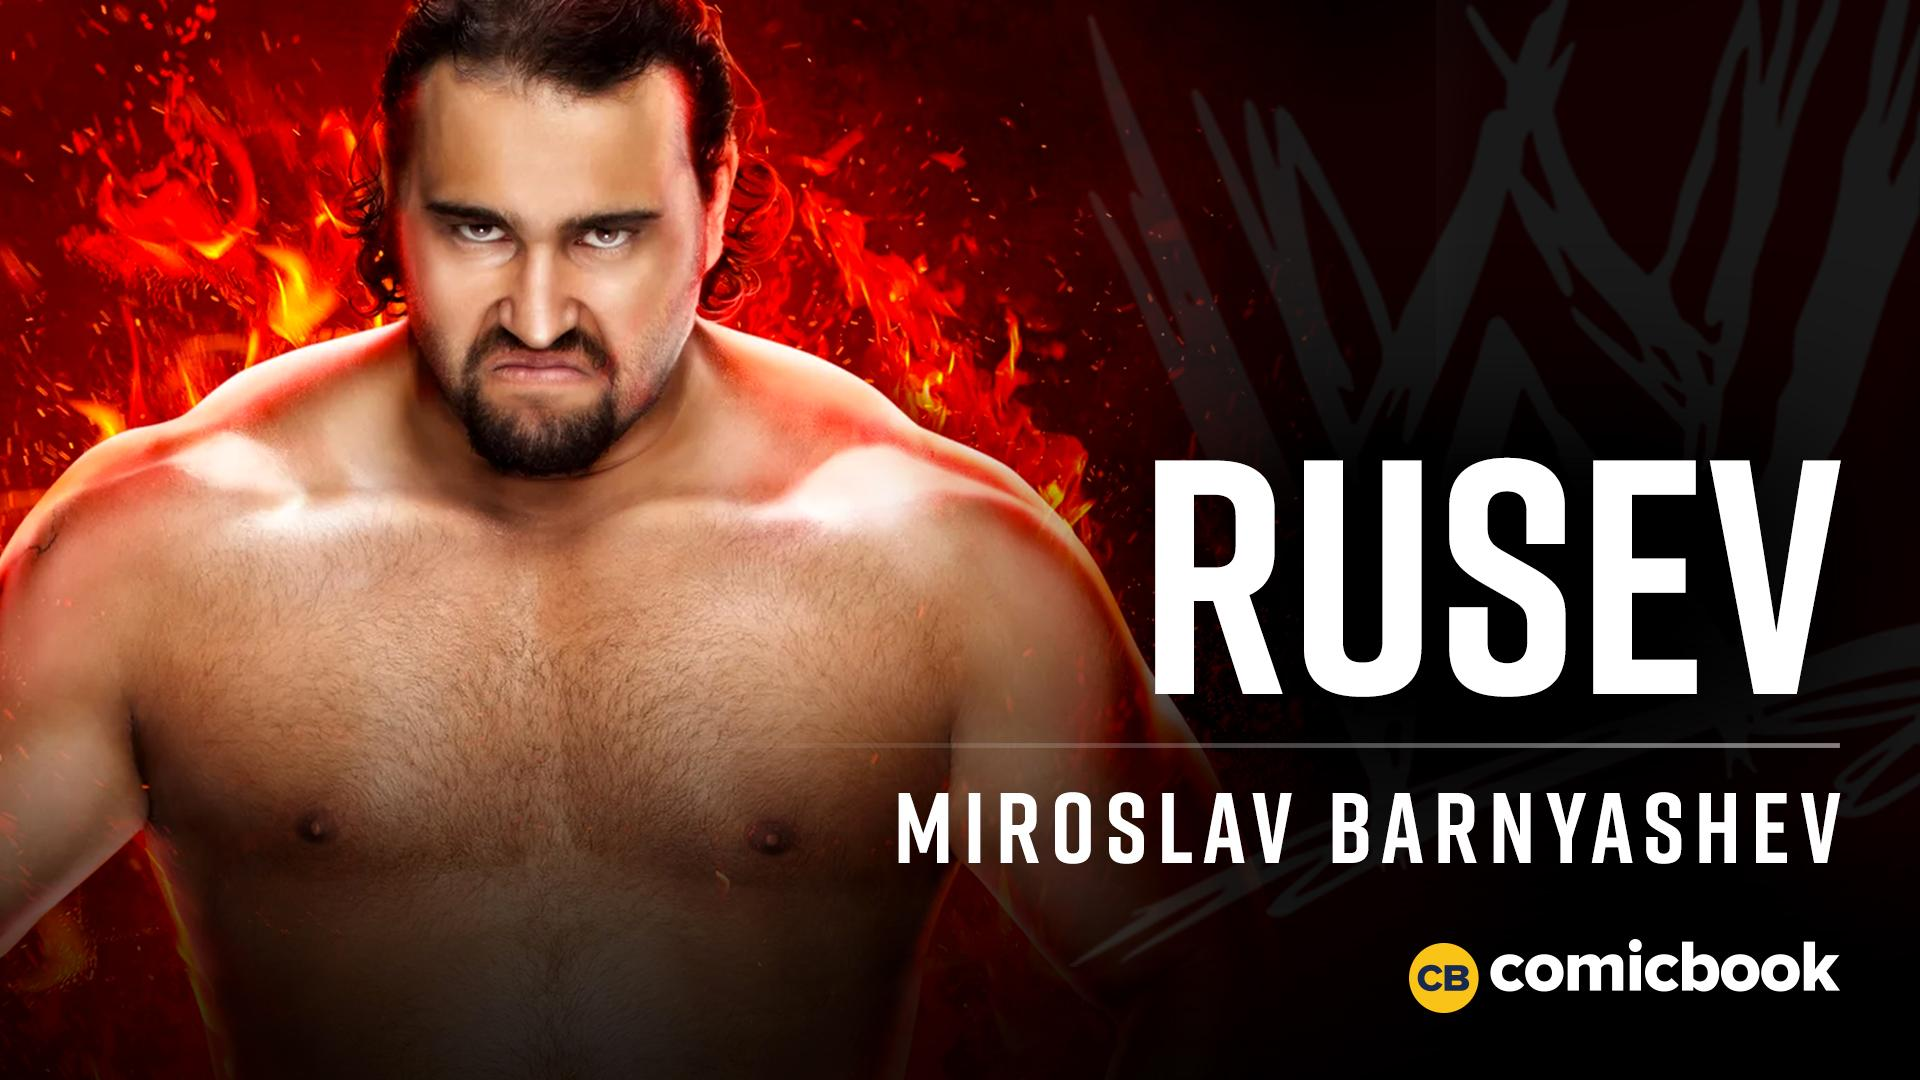 Miroslav Barnyashev (Rusev) - ComicBook.com Exclusive WWE Interview screen capture